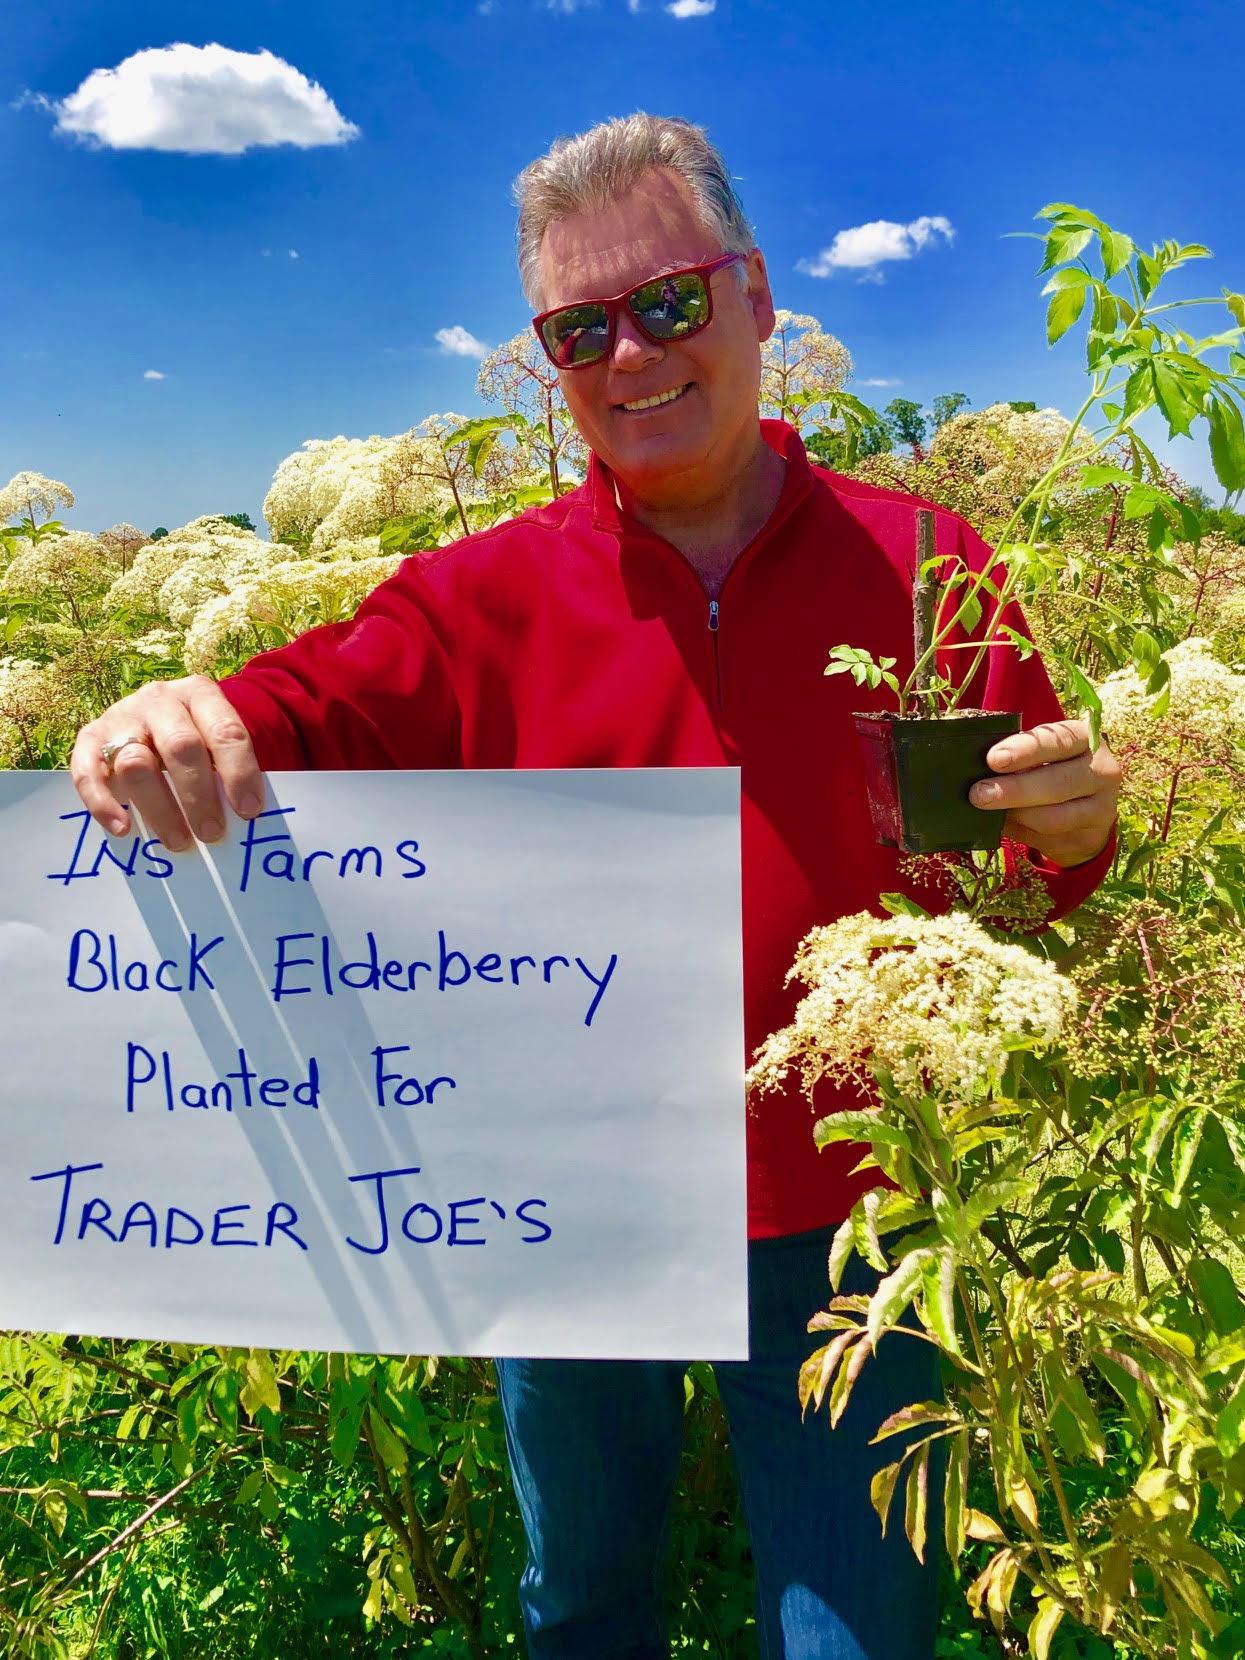 Plant-Elderberry-Trader-Joes.jpg